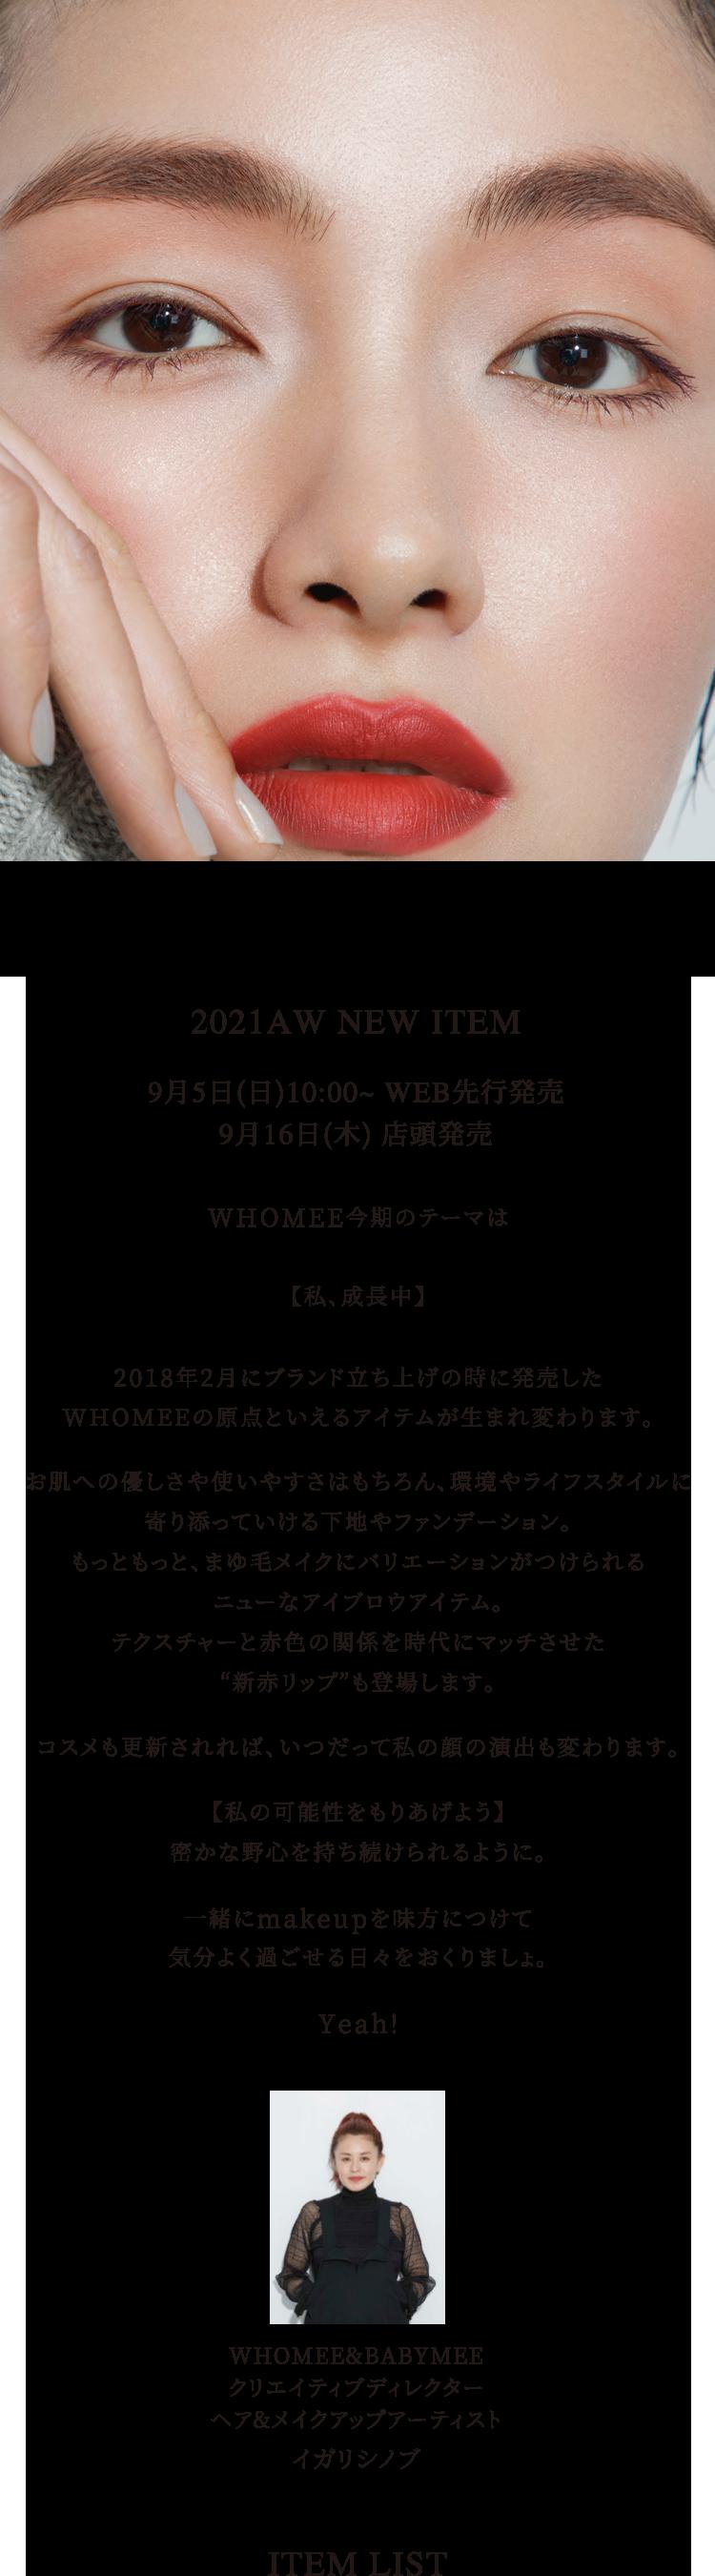 WHOMEE2021AW新作